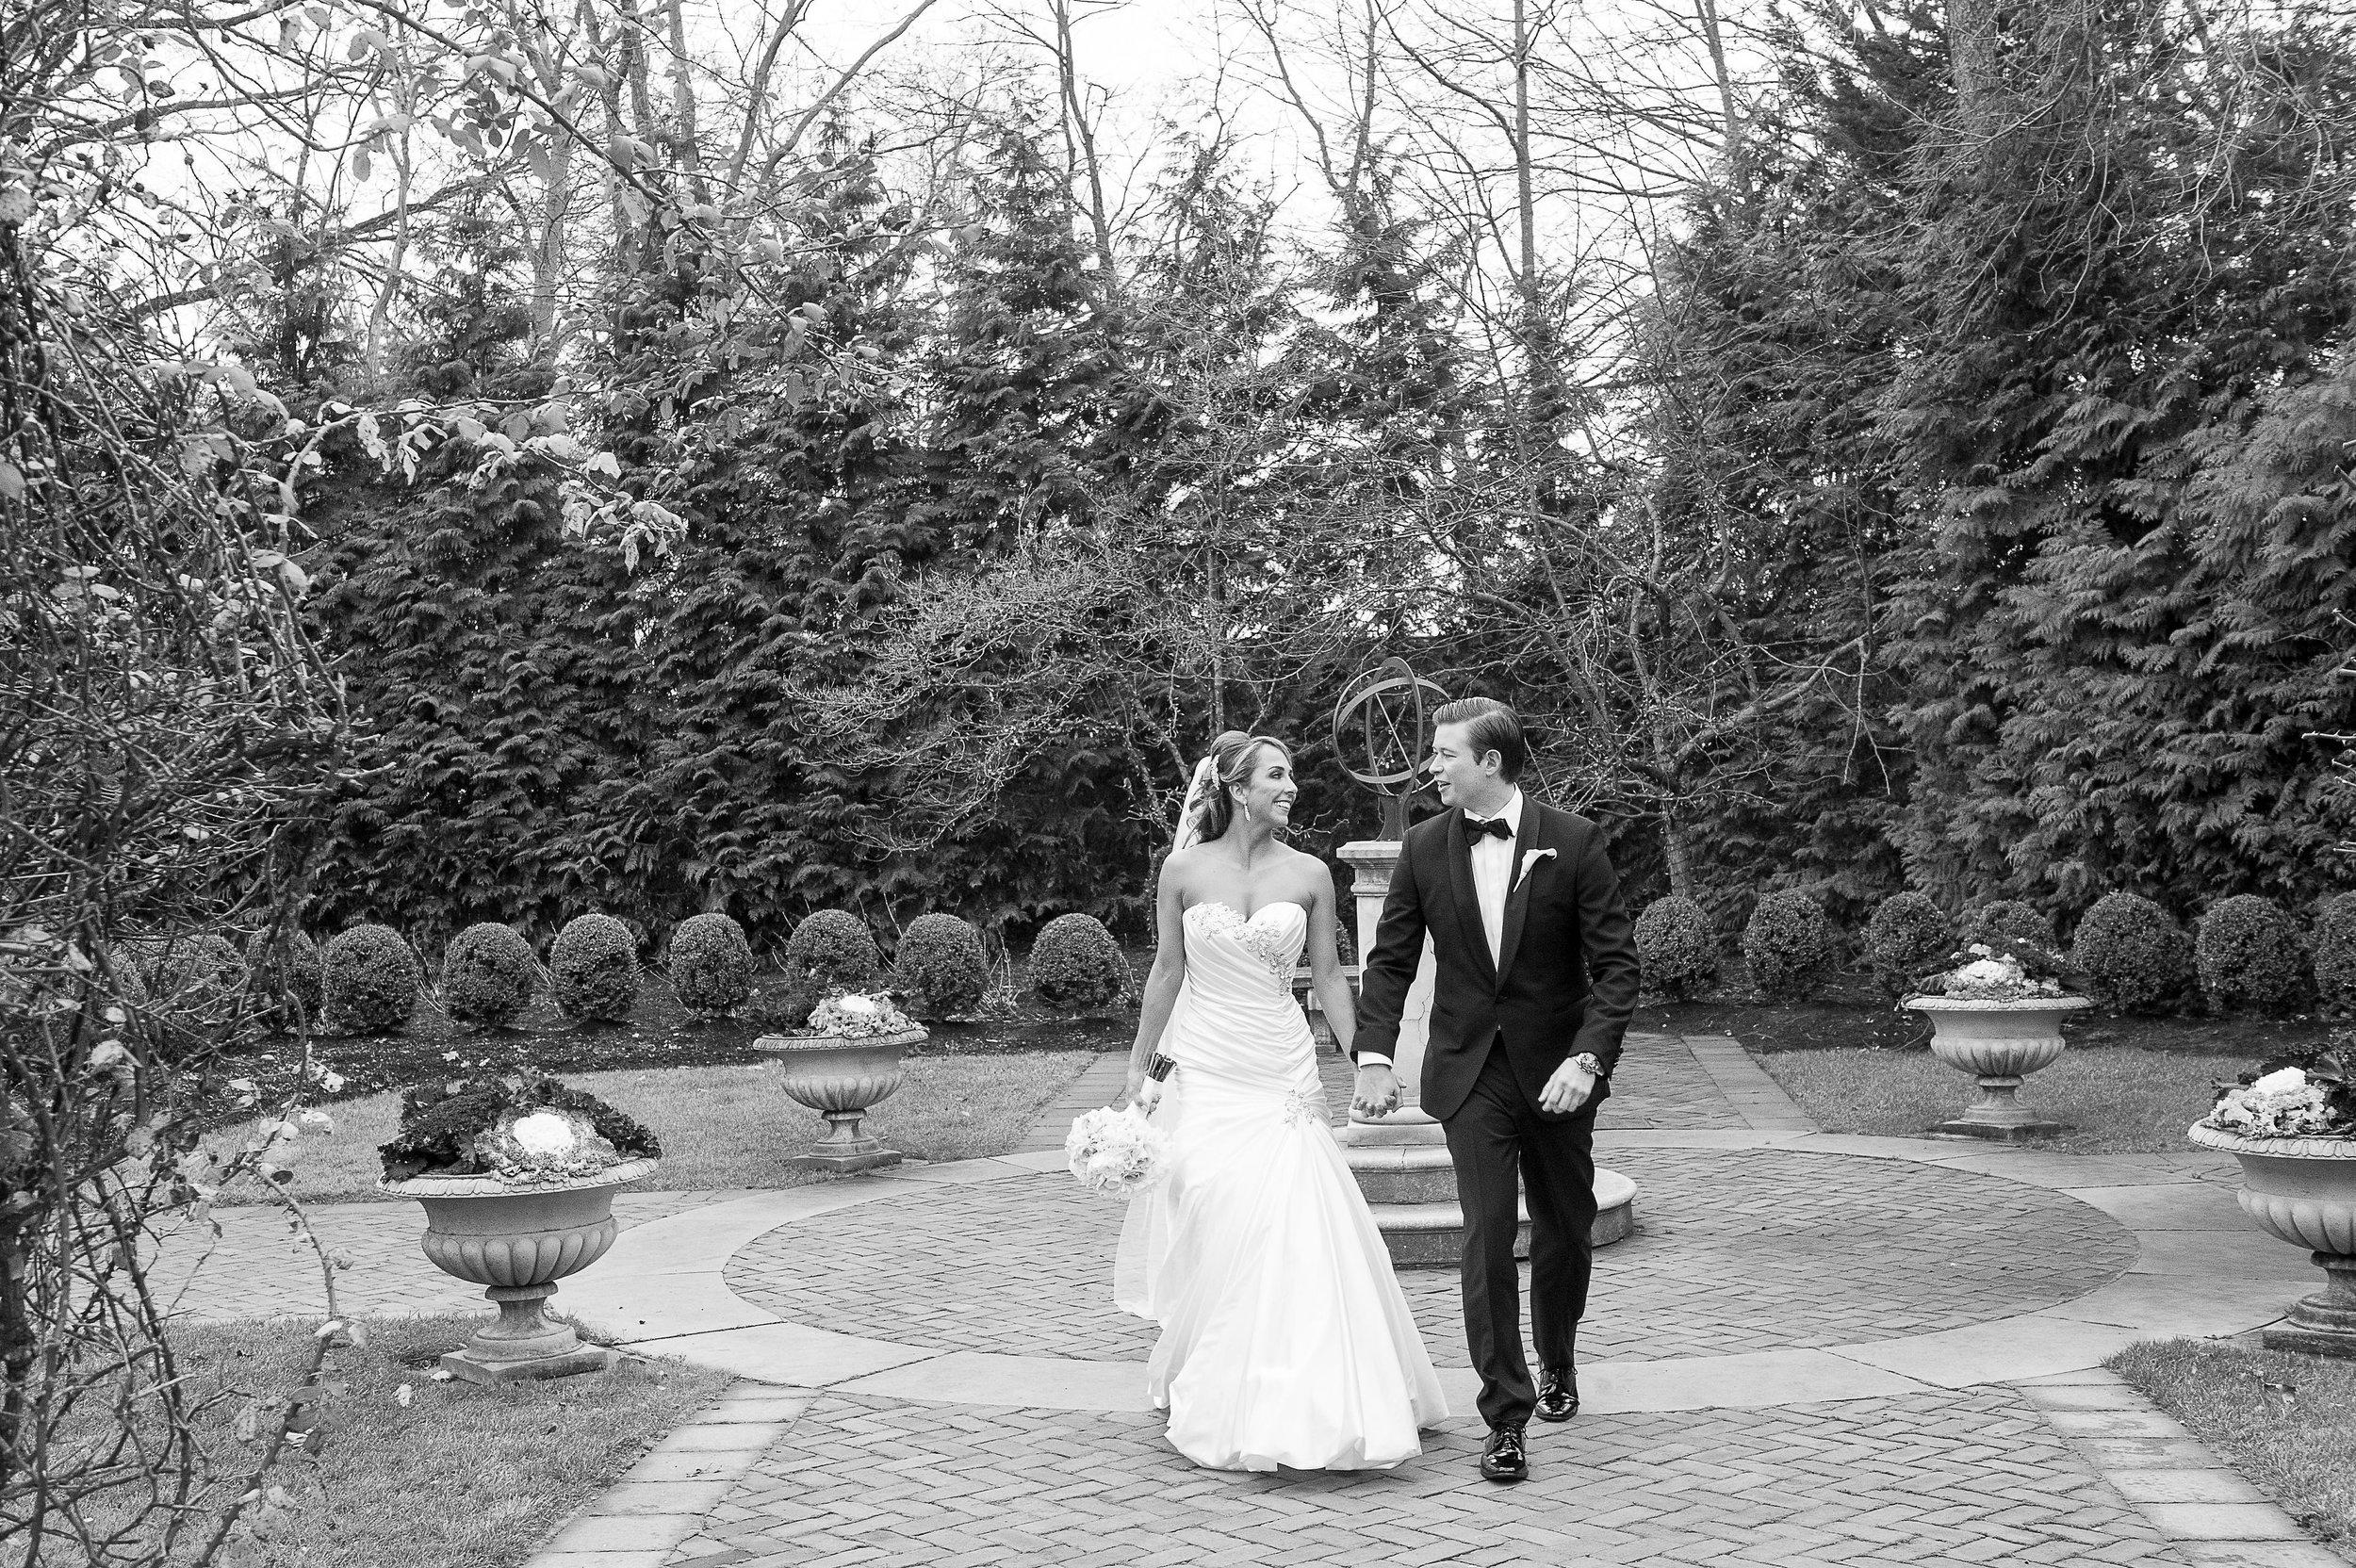 Ceci_New_York_Custom_Invitation_ New_Jersey_Wedding_Luxury_Personalized_Ceci_Style_Bride_Foil_Stamping100.JPG